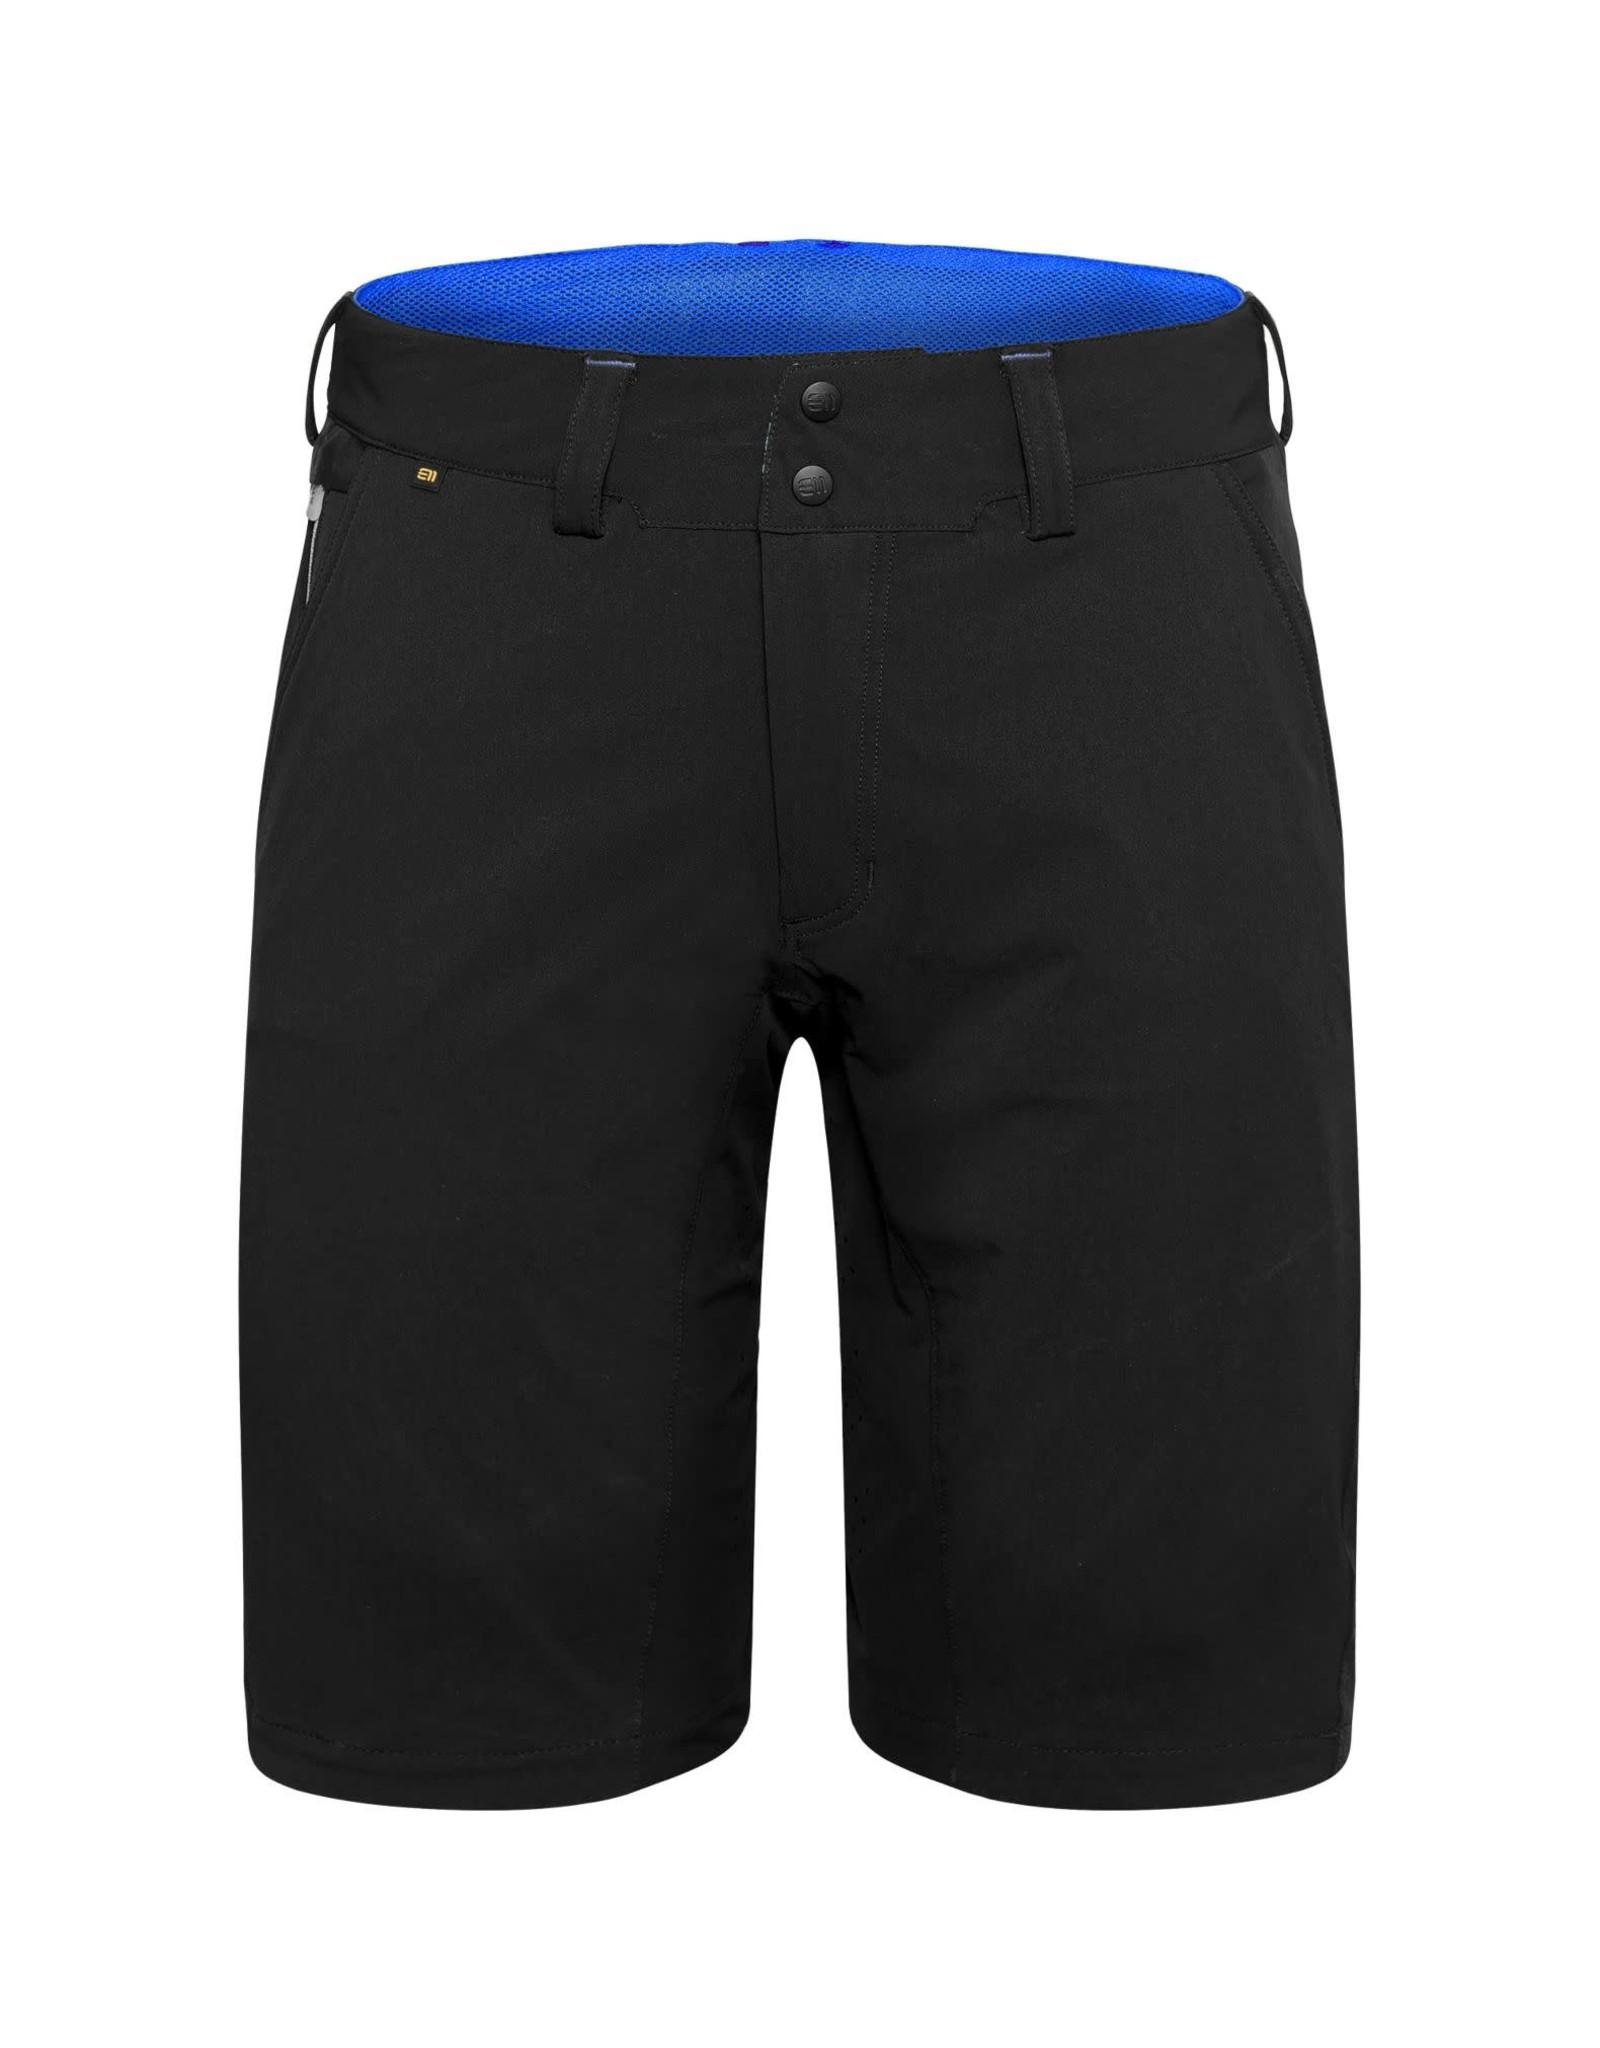 Elevenate Versatility Shorts